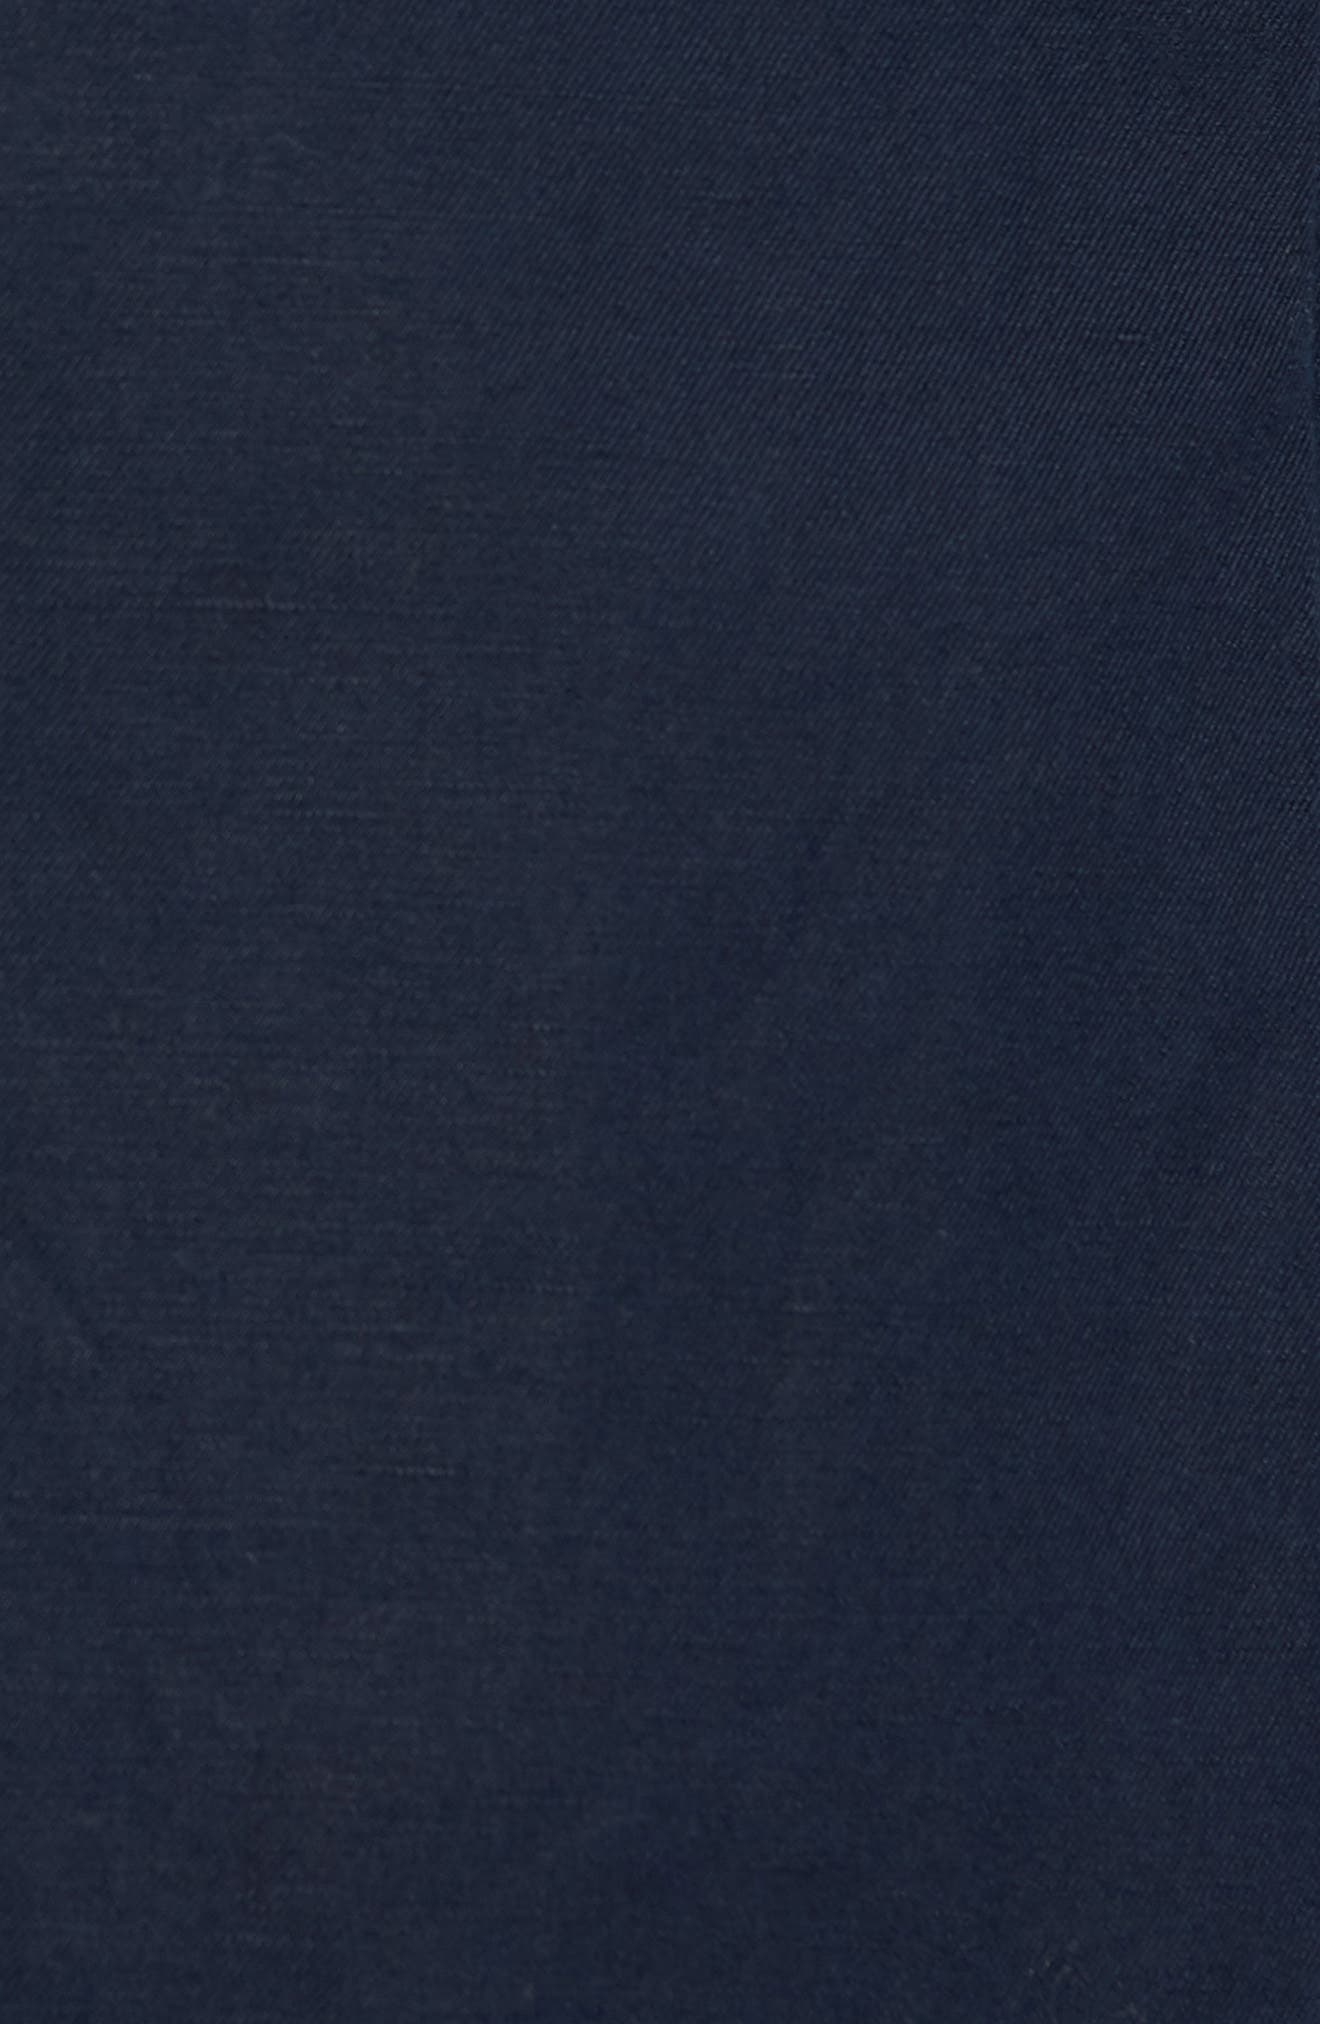 Maxwell Valley Cotton & Linen Sport Coat,                             Alternate thumbnail 6, color,                             MIDNIGHT